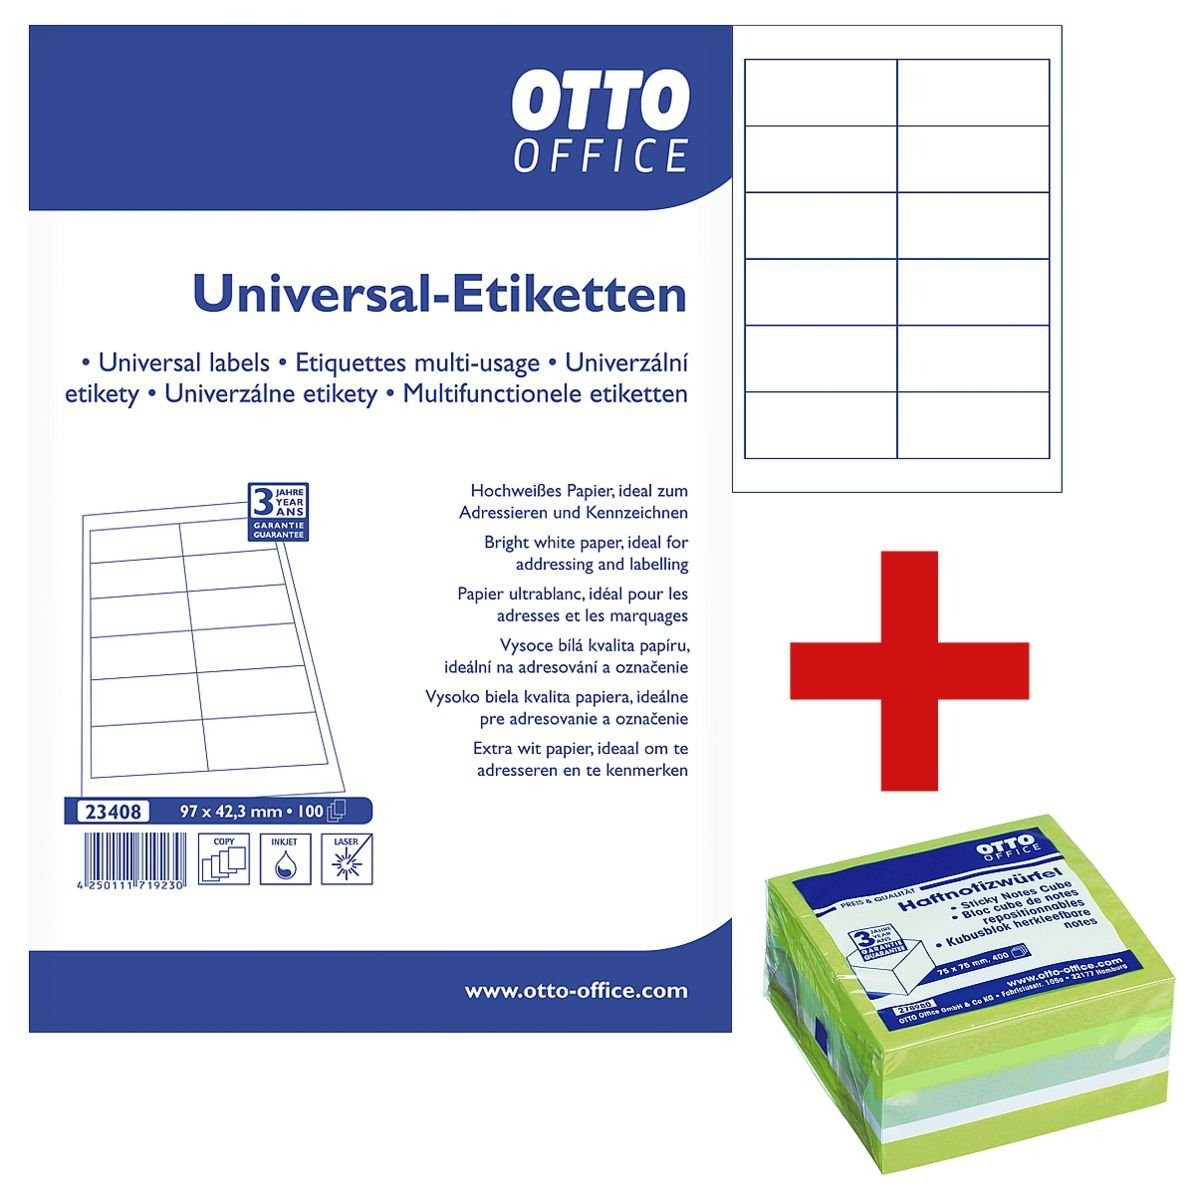 OTTO Office Standard 1200er-Pack Universal Klebeetiketten inkl. Haftnotizwürfel 1 Set